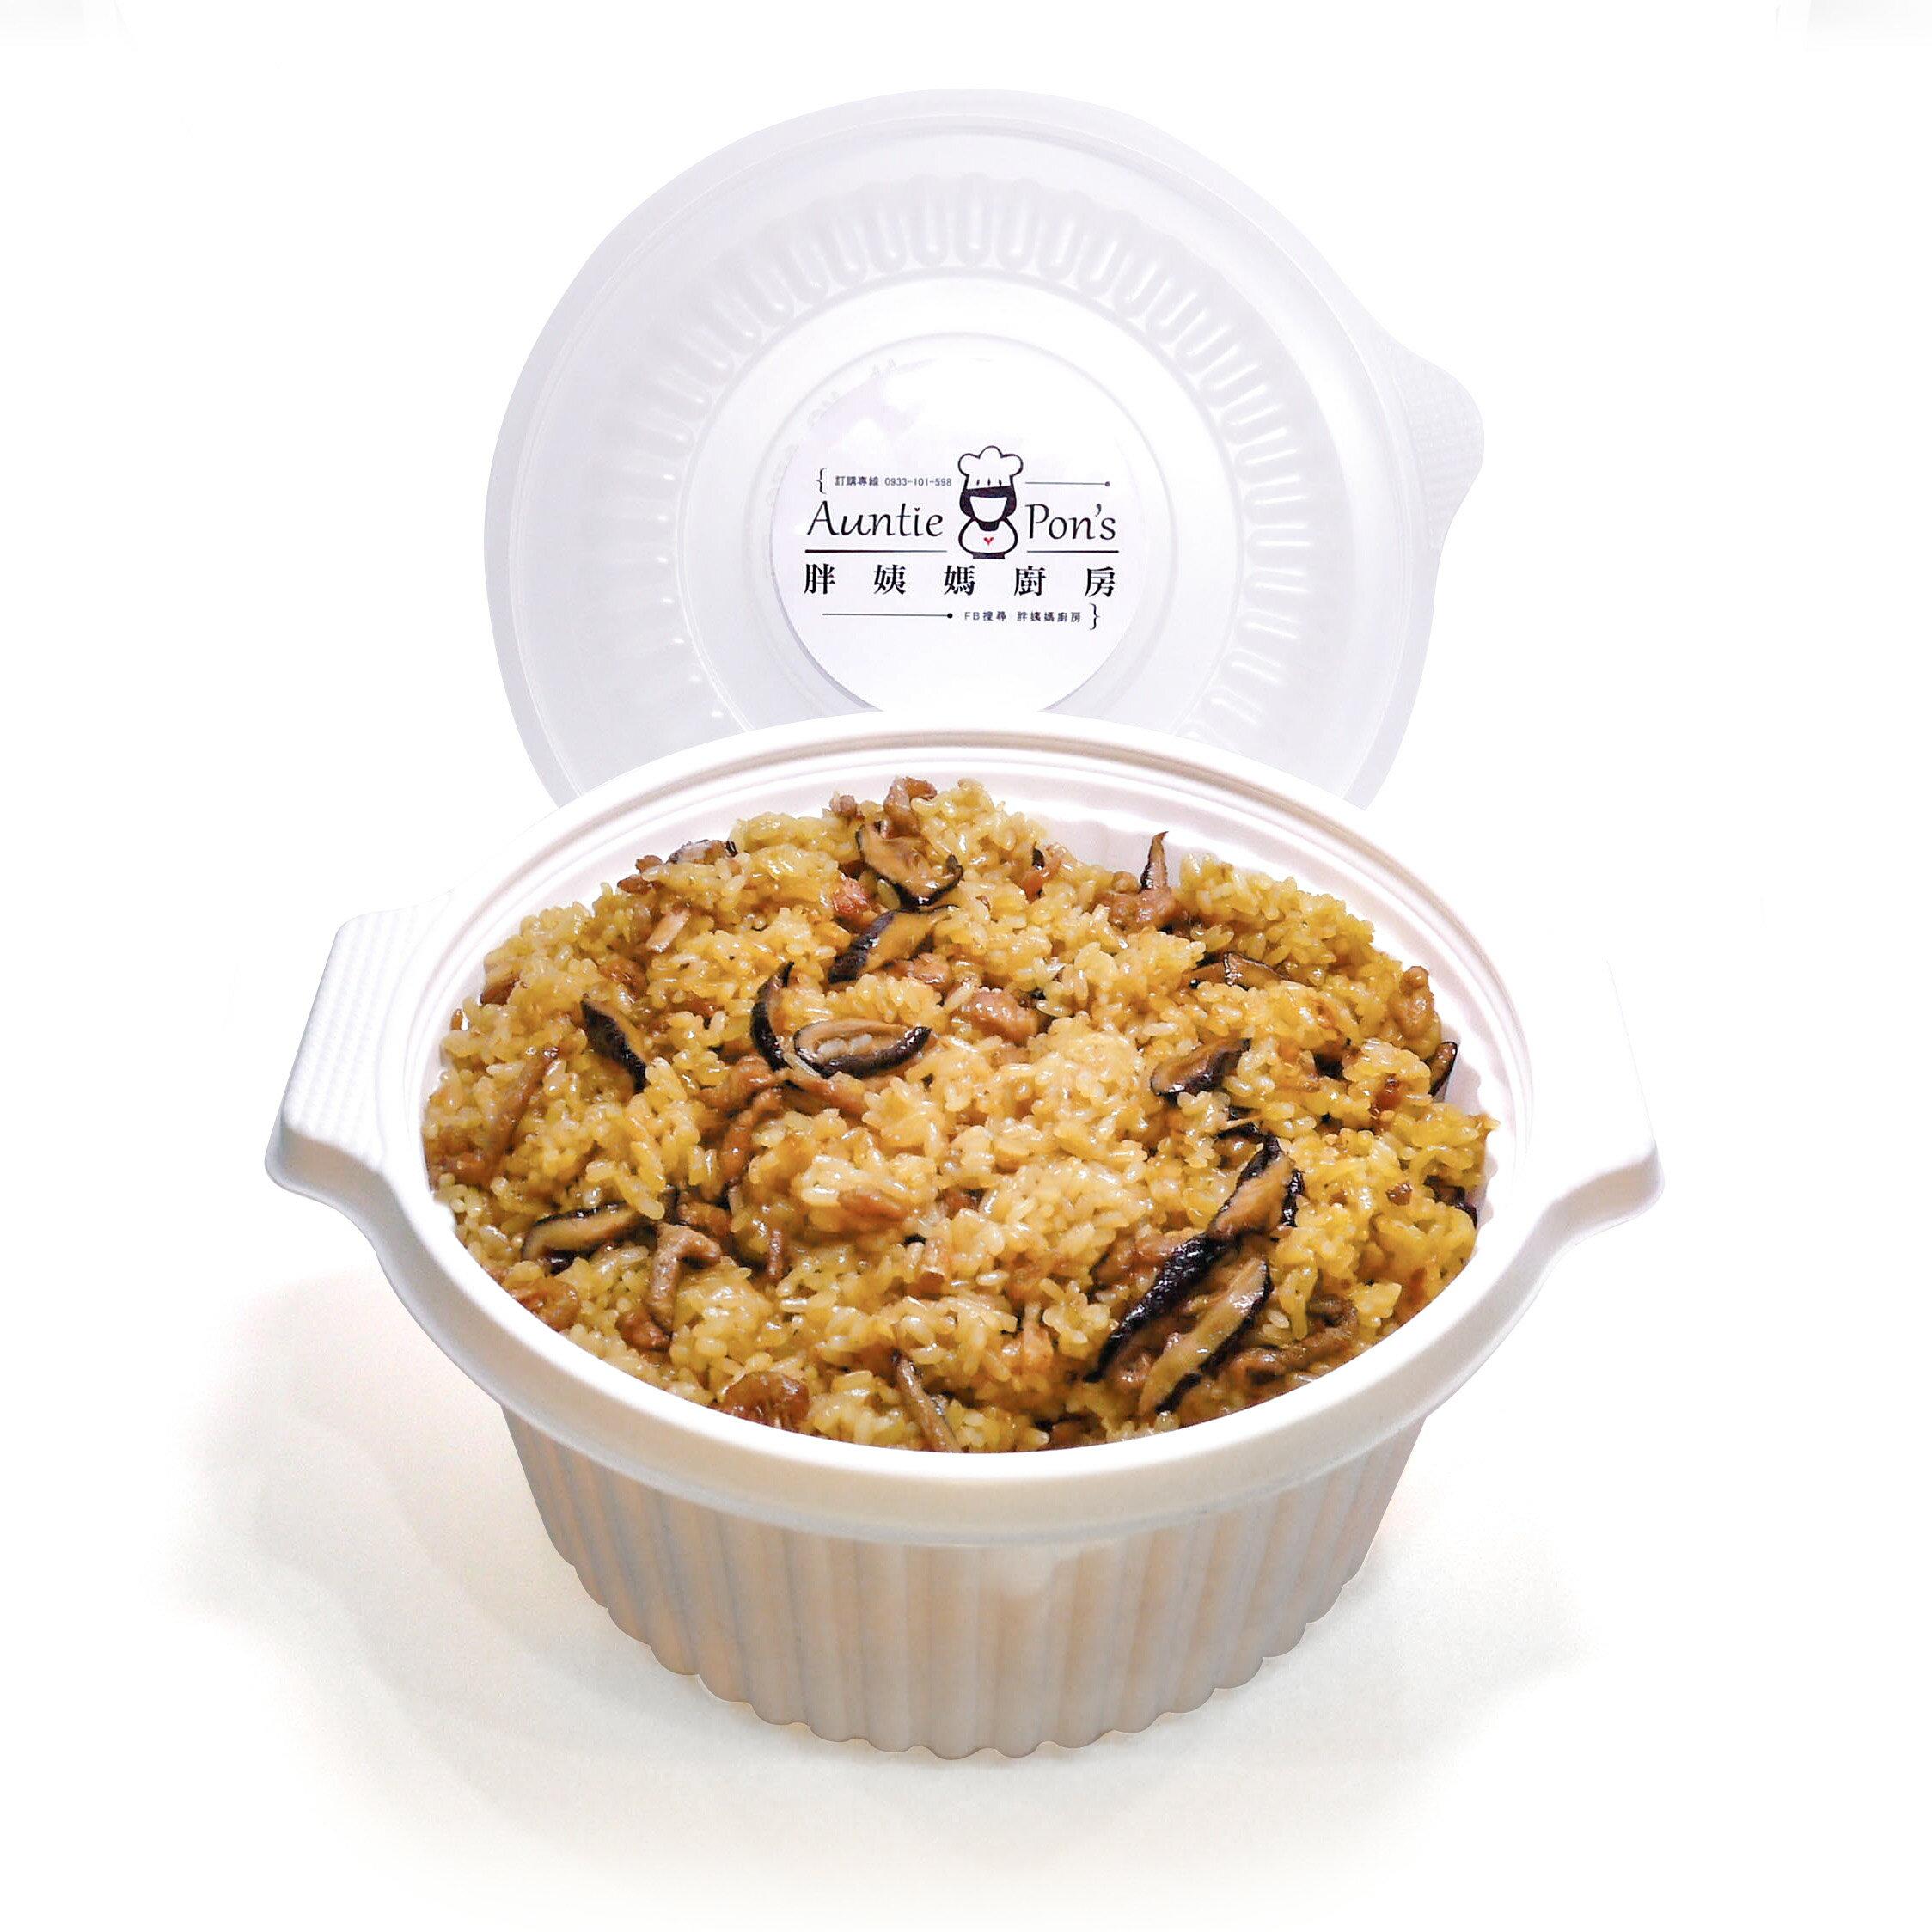 <br/><br/> [胖姨媽廚房] 招牌手工彌月油飯分享盒_十斤<br/><br/>